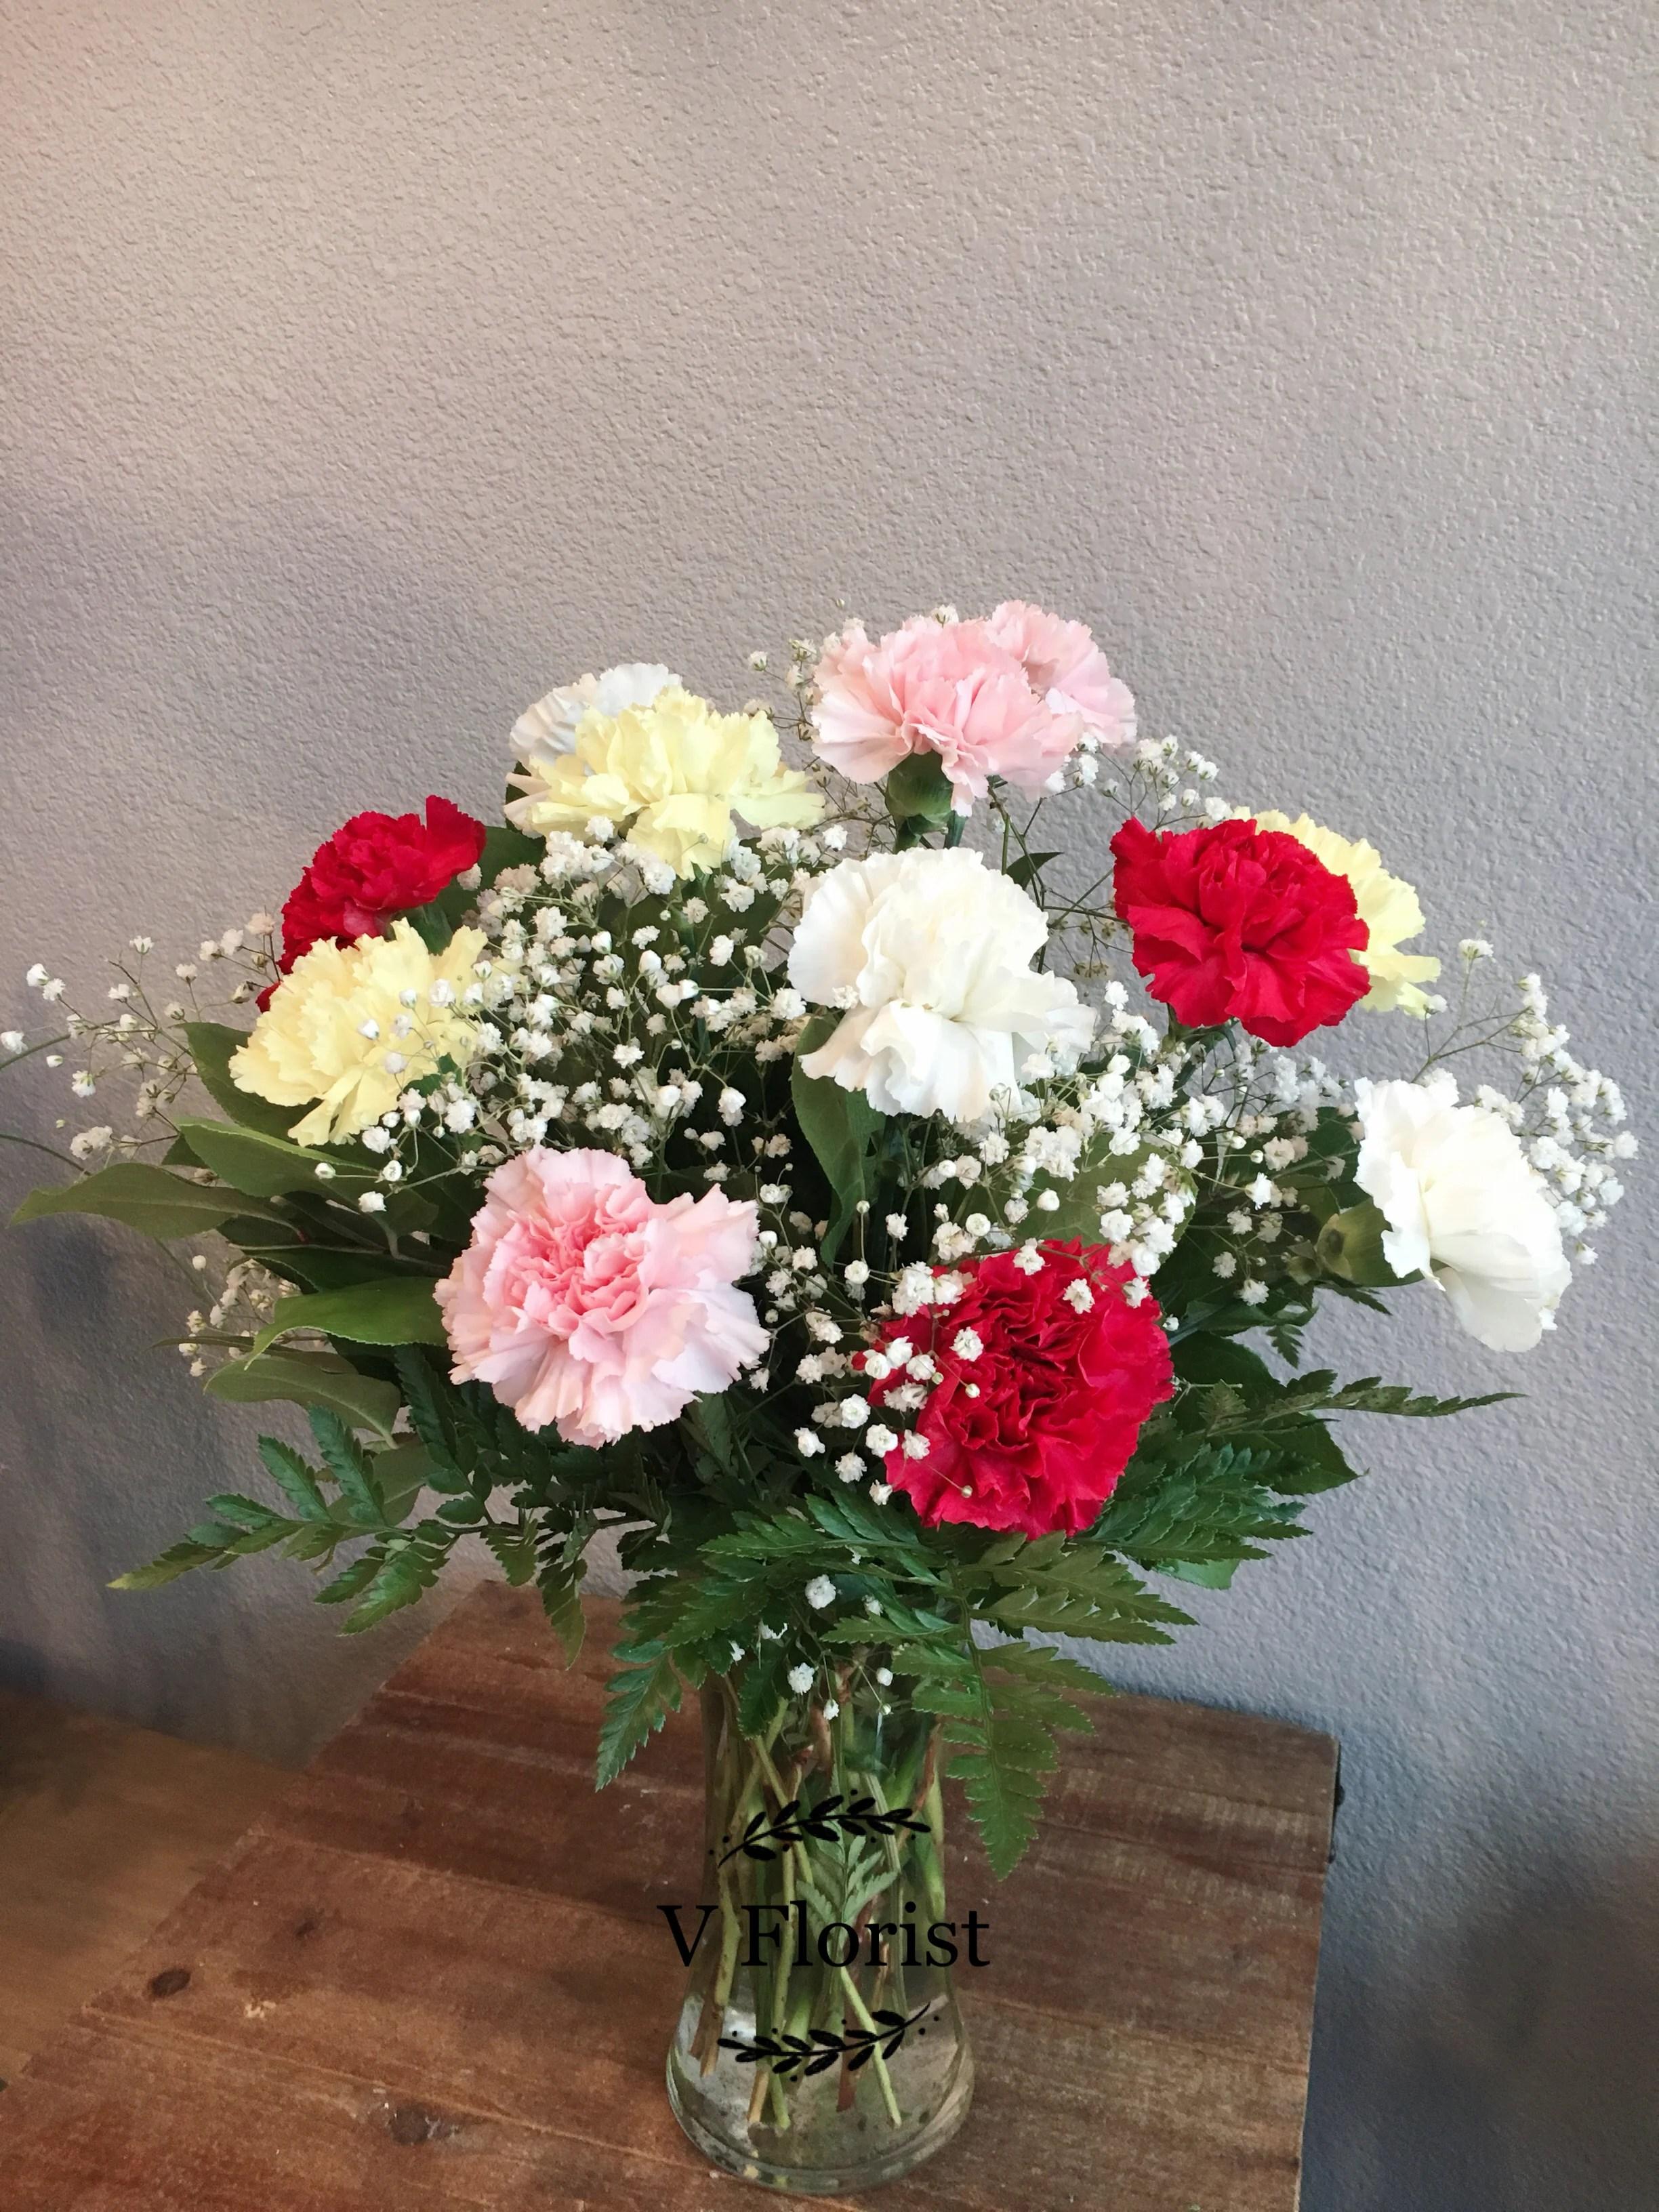 Pics Of Carnations : carnations, Assorted, Carnations, Arrangement, Vegas,, Florist